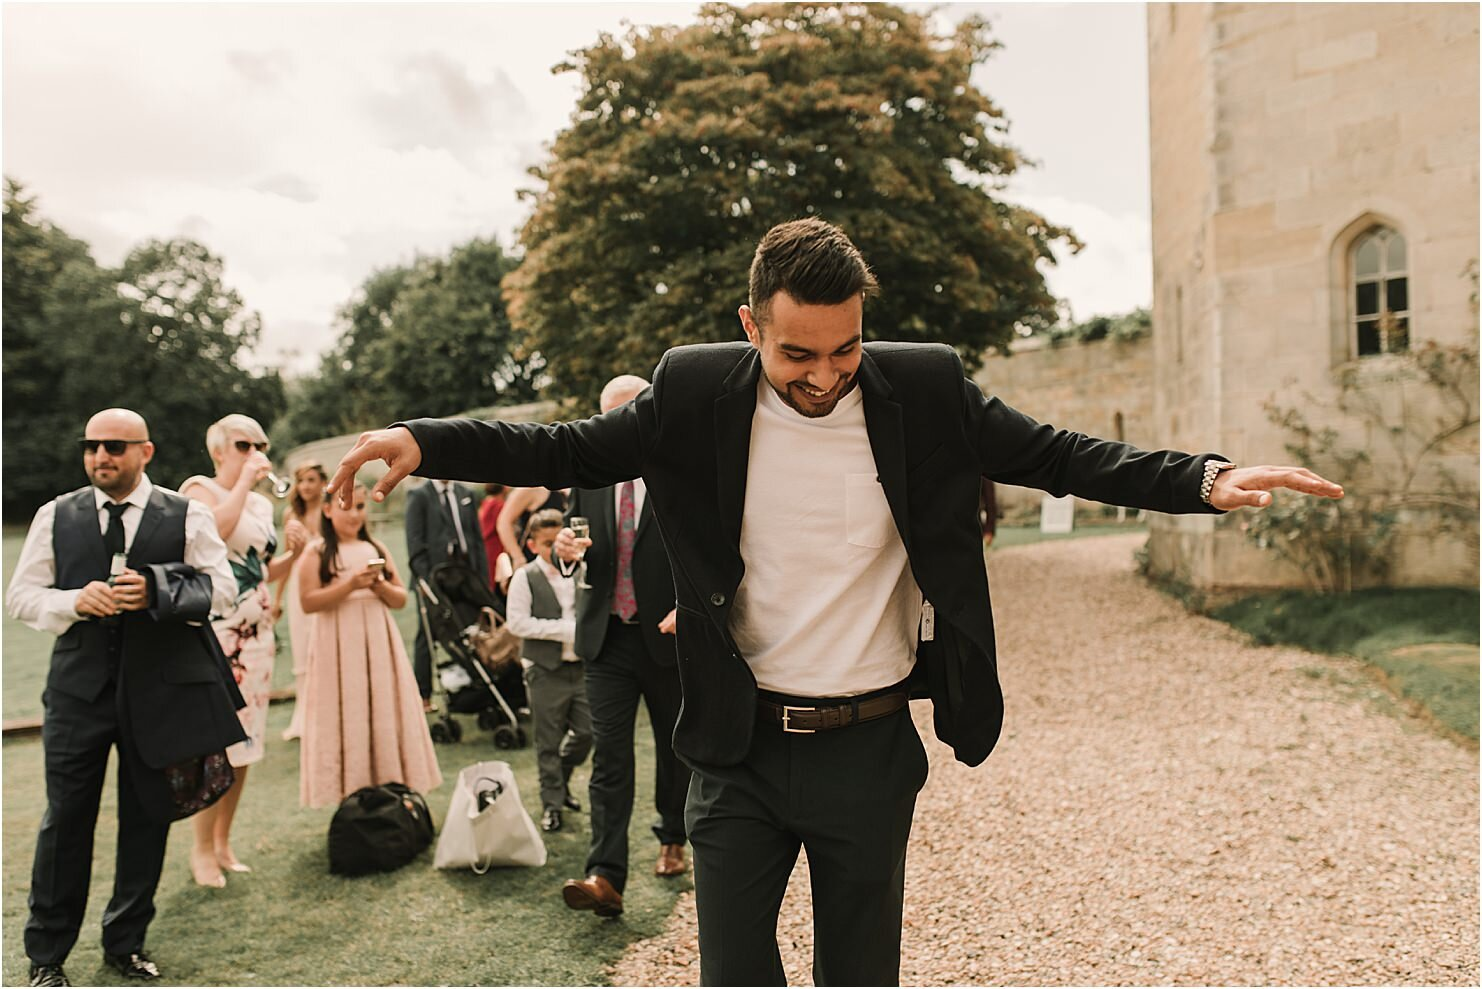 boda-de-cuento-en-castillo-boda-en-londres-111.jpg